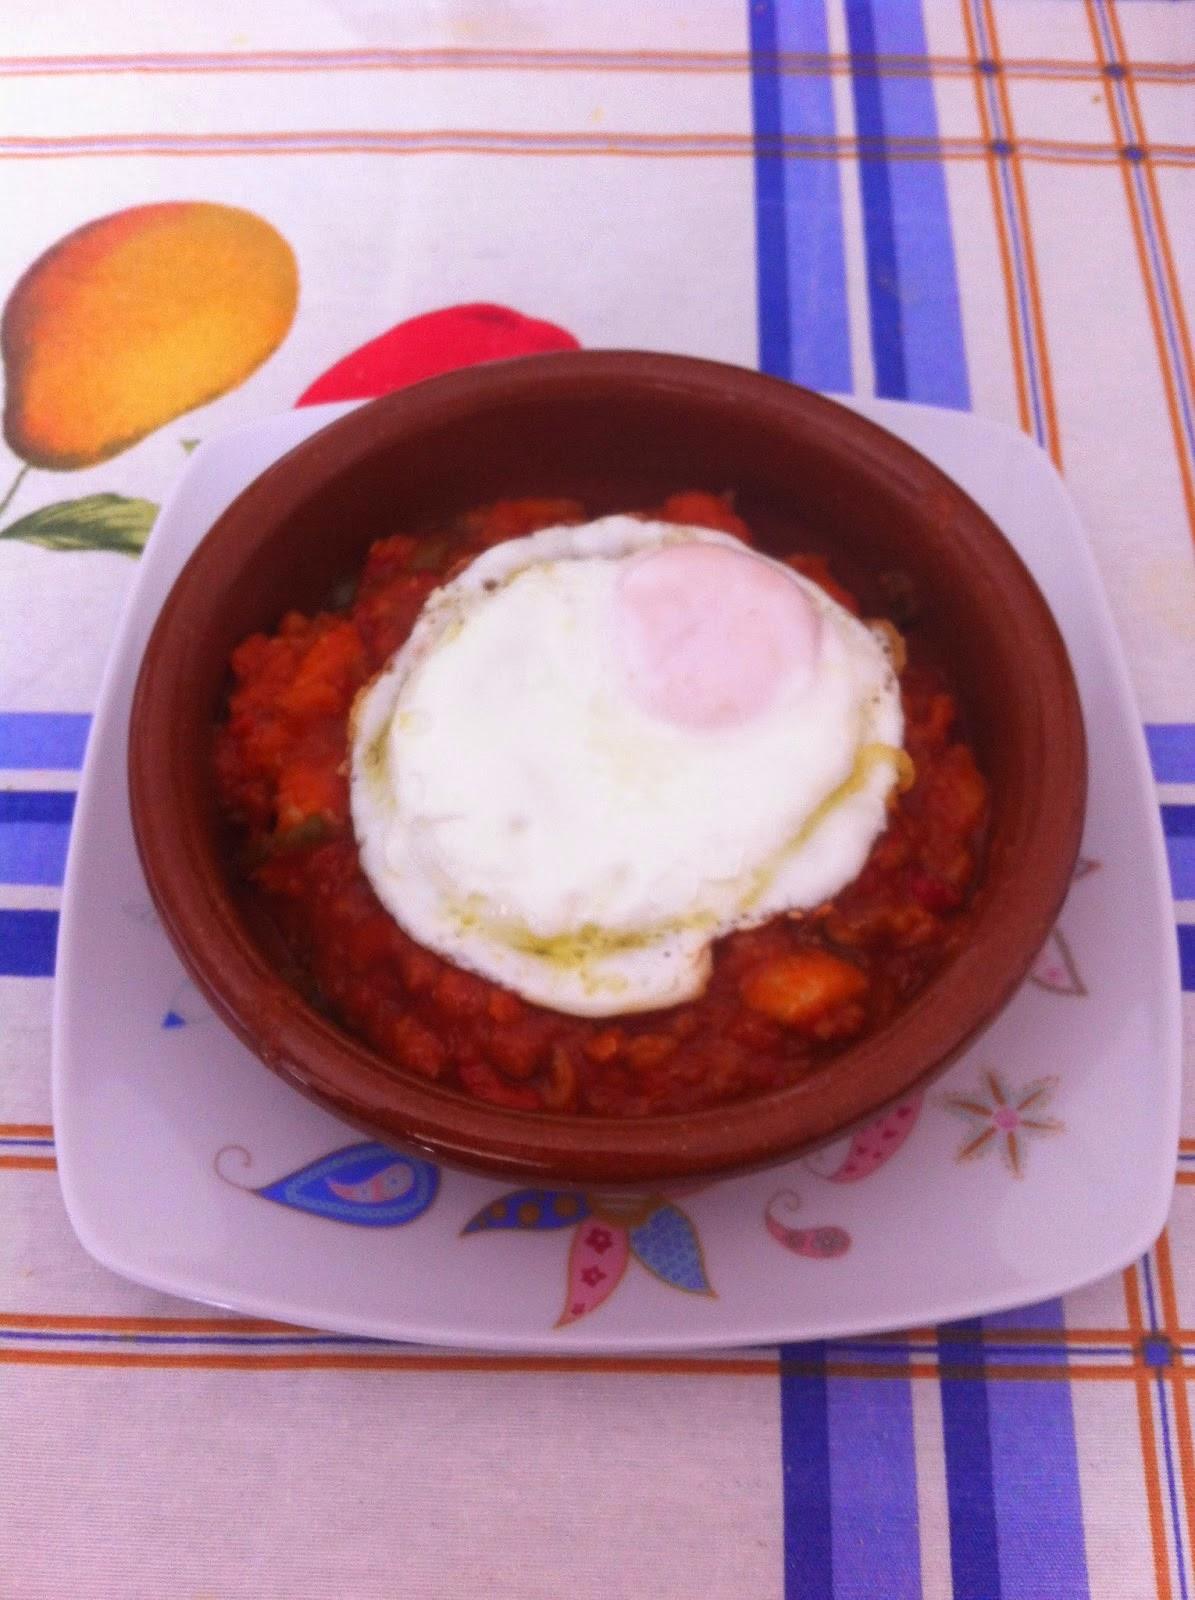 http://lashermanasyunamarx.blogspot.com.es/2014/05/bacalao-con-tomate.html